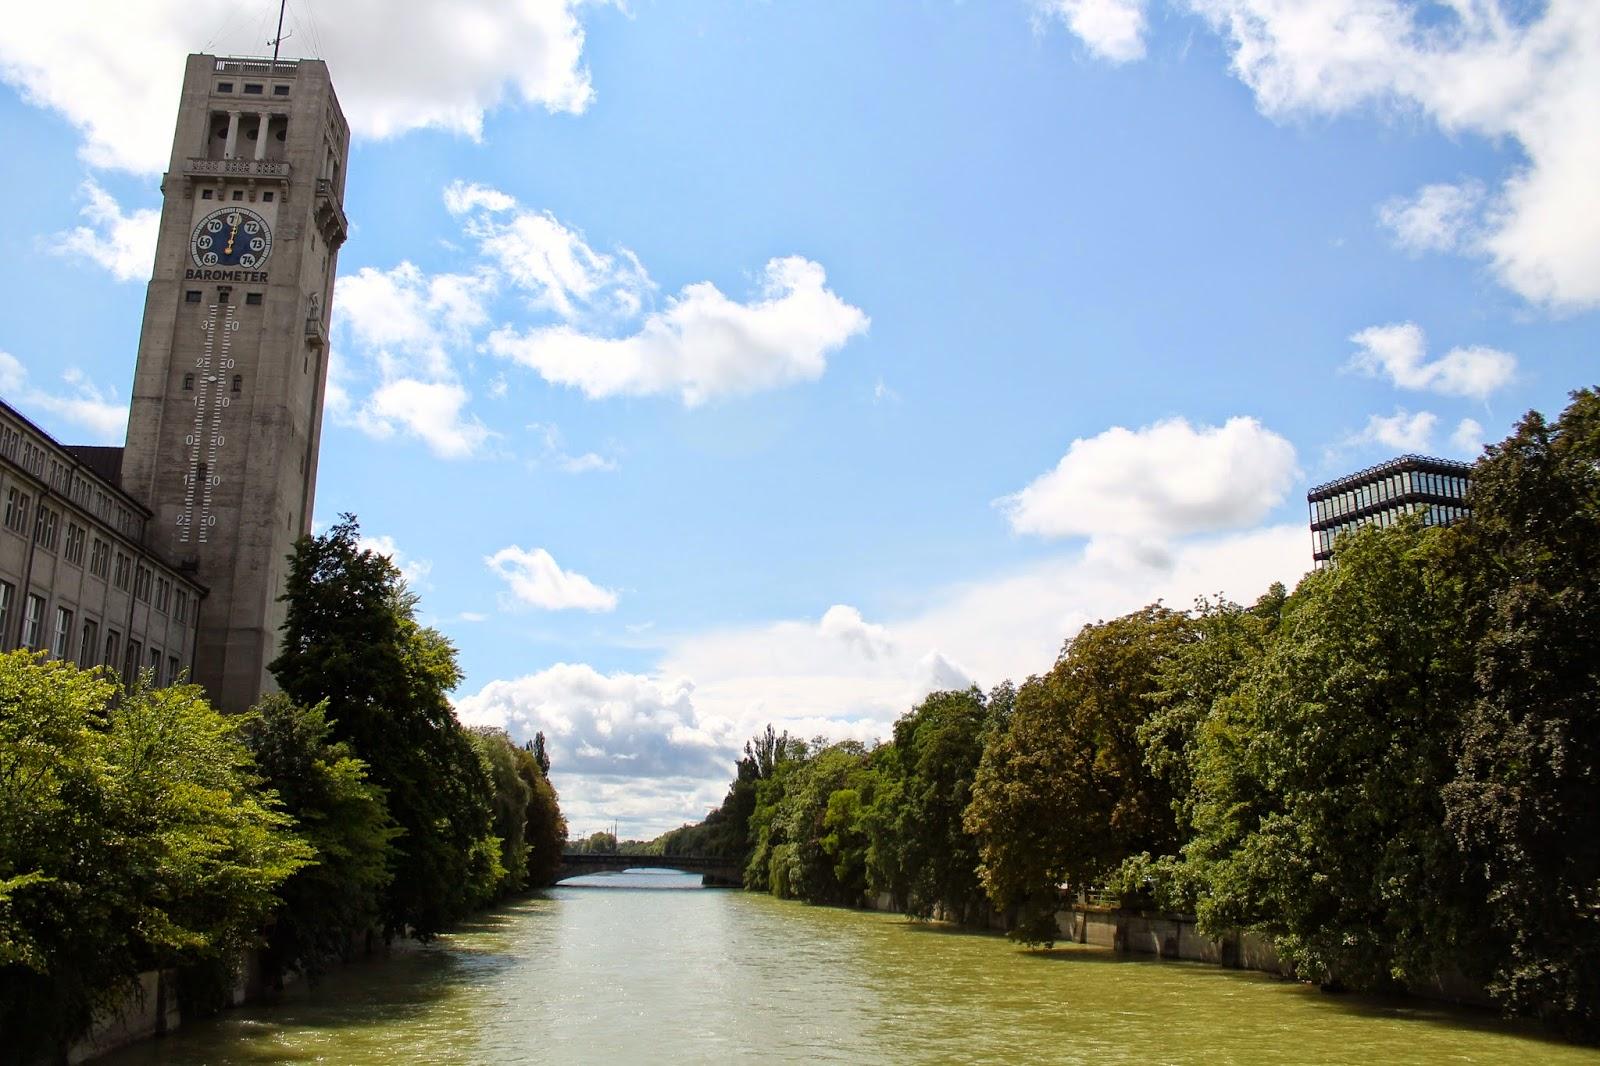 Deutsches Museum y el río Isar. ¡Munich! en Hitzen Mundua